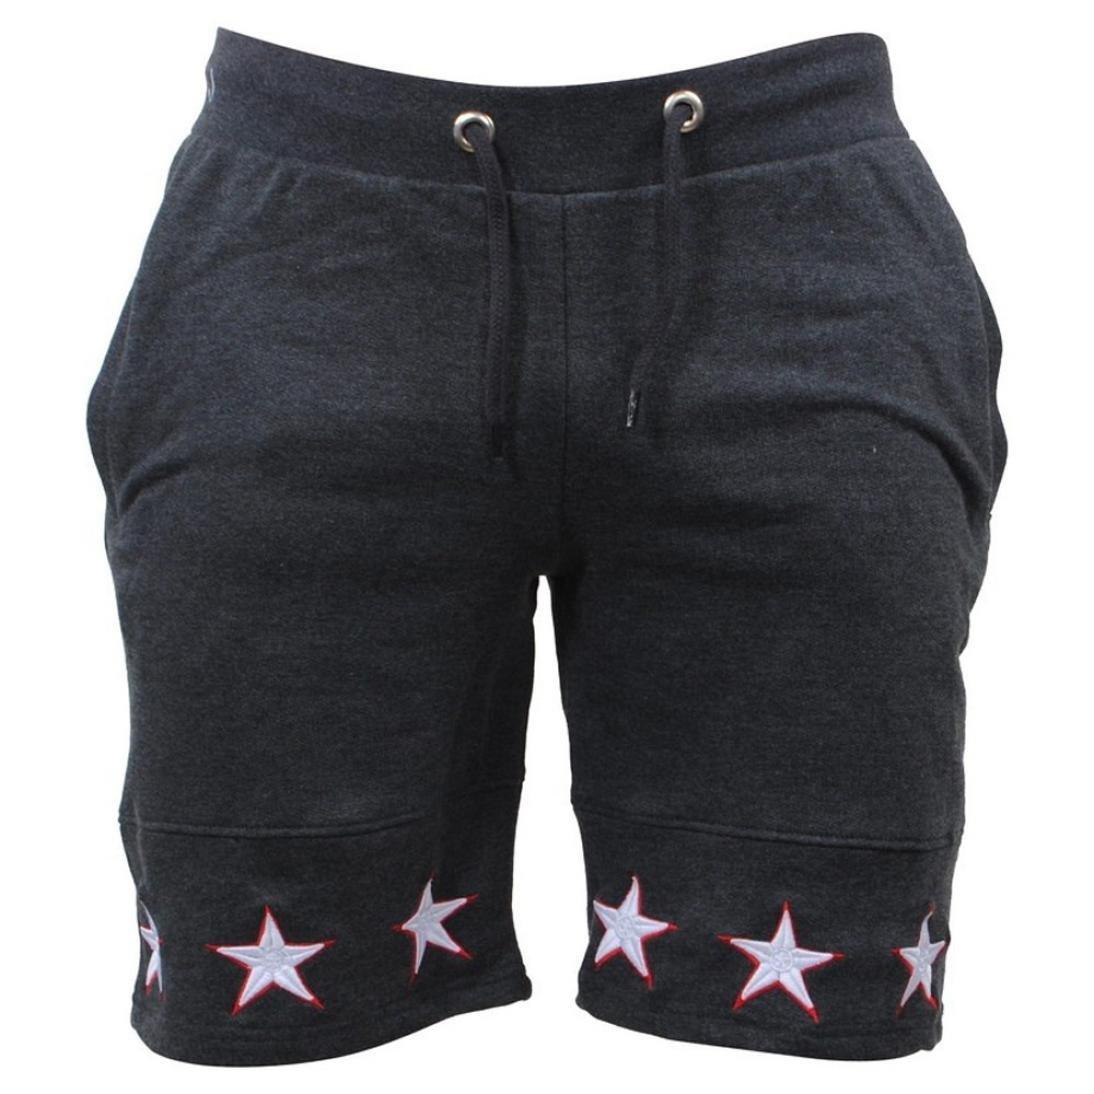 AMSKY❤Men's Shorts, Men Star Casual Pocket Beach Soft Cotton Elastic Workout Jogger Gym Active Sports Work Shorts (L, Dark Gray)